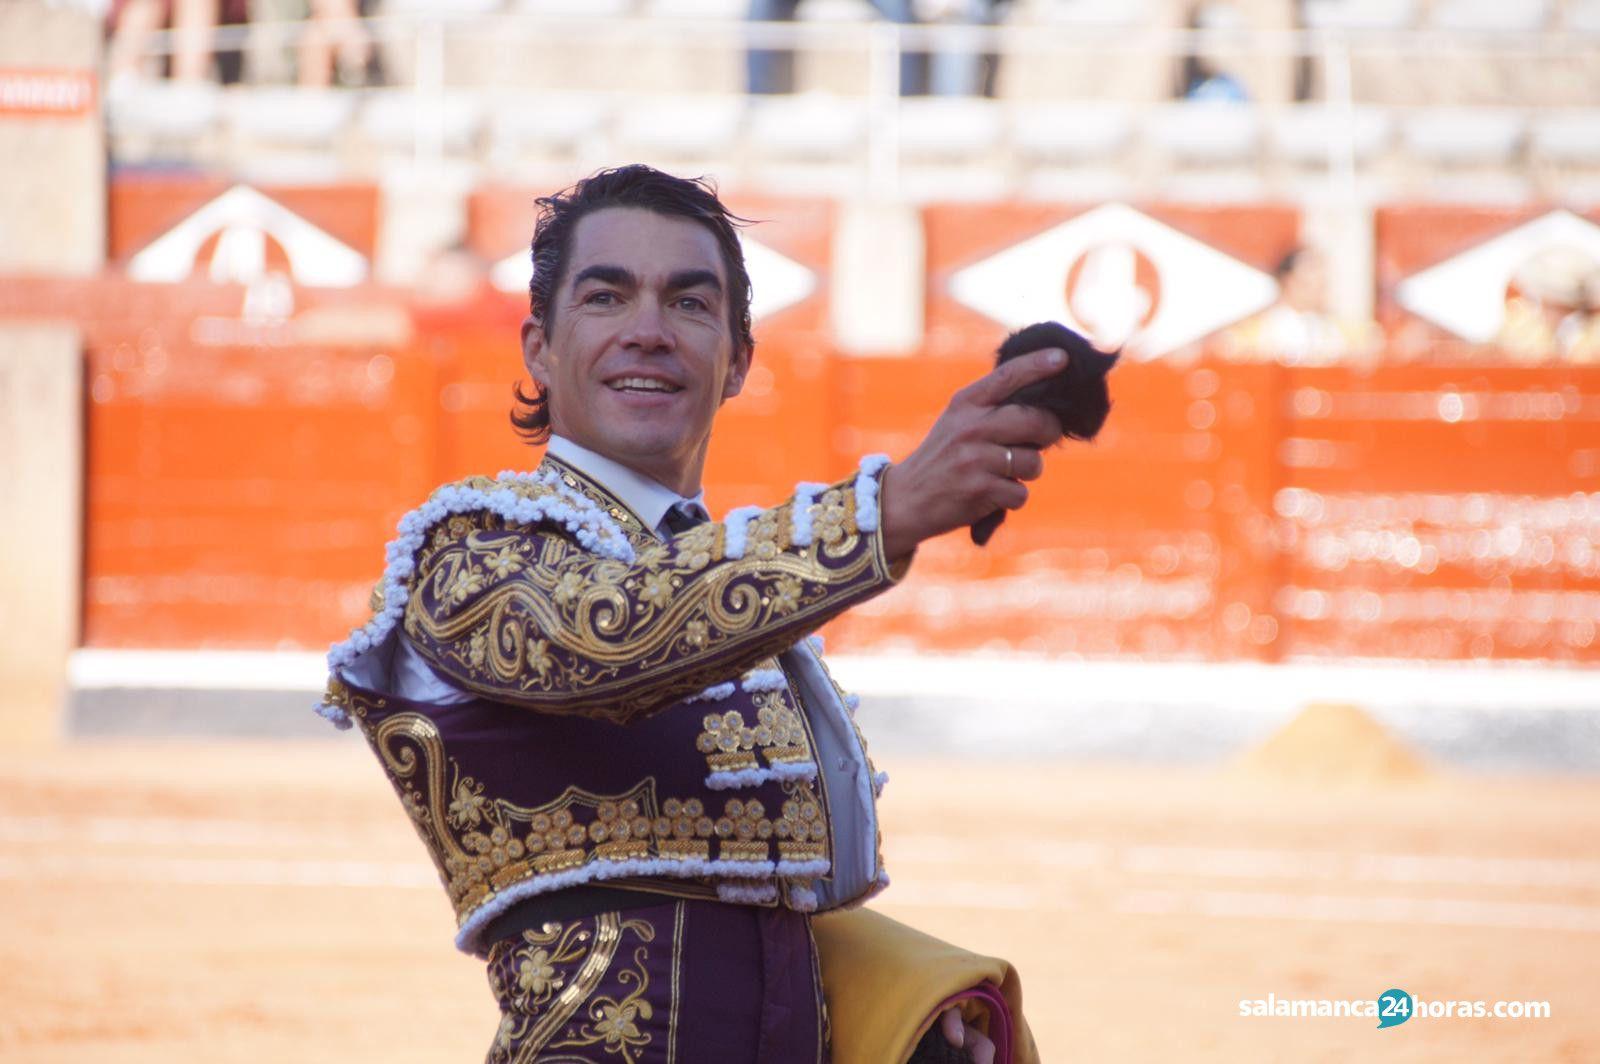 López Chaves Primer Toro 2